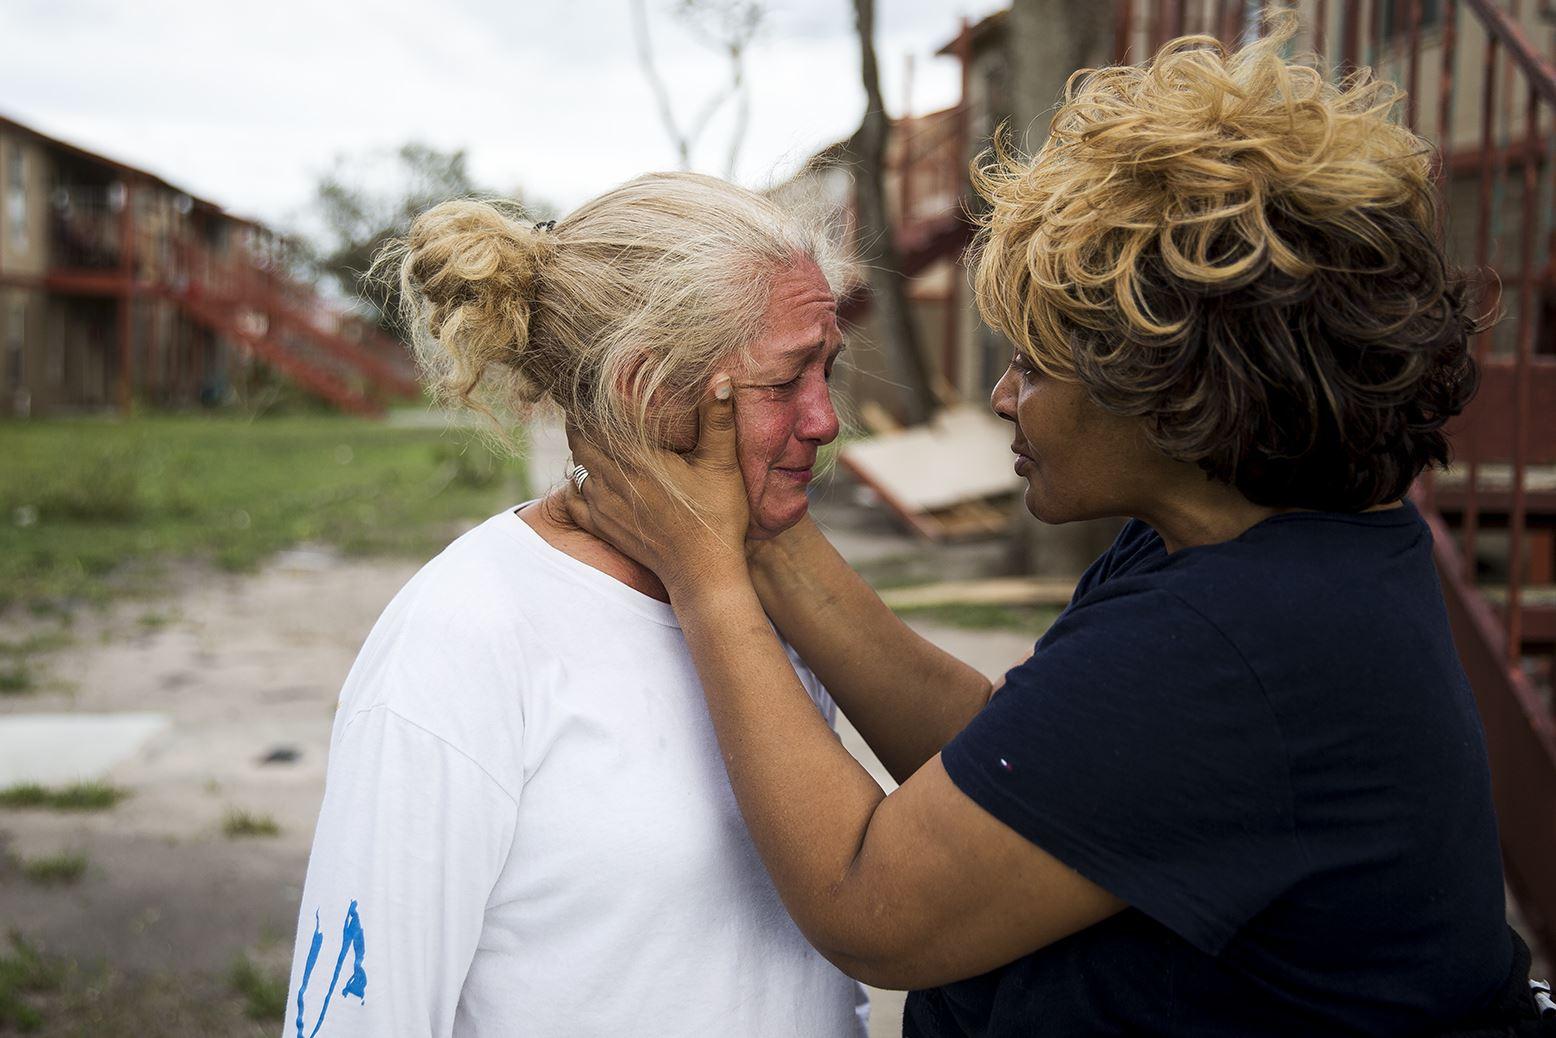 "APTOPIX Harvey-2 Genice Gipson comforts her lifelong friend, Loretta Capistran, outside of Capistran's apartment complex in Refugio, Texas, on Monday. ""We got to be strong, baby,"" Gipson told Capistran."